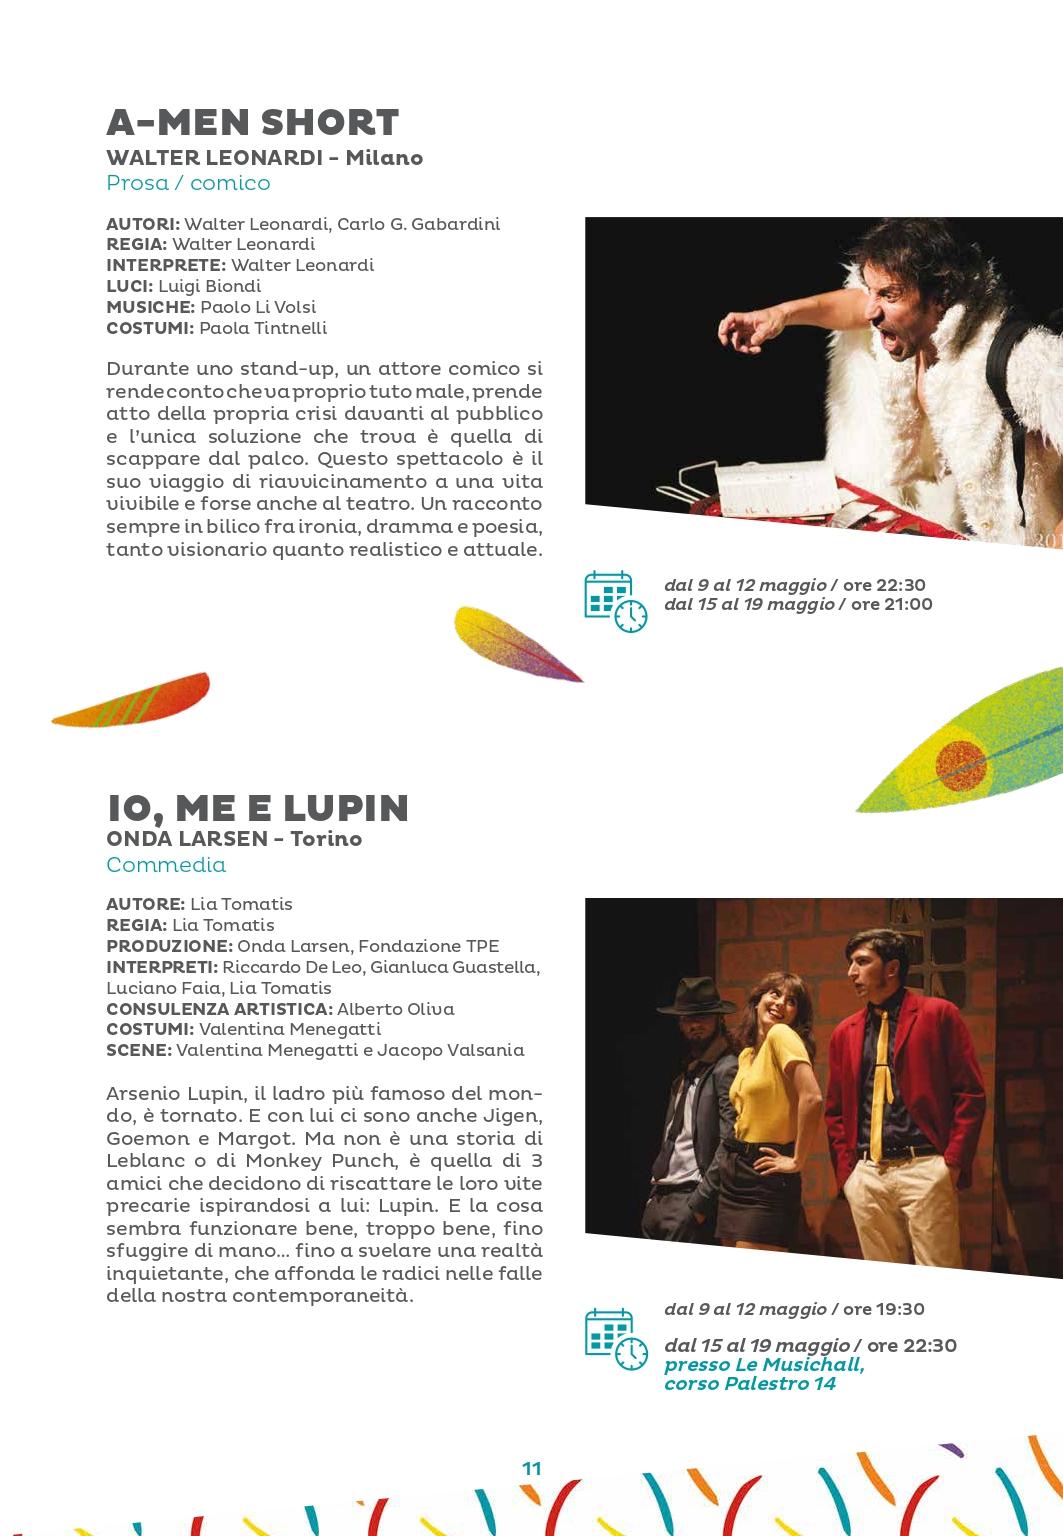 tabloid bassa 2 -10-11_page-0002